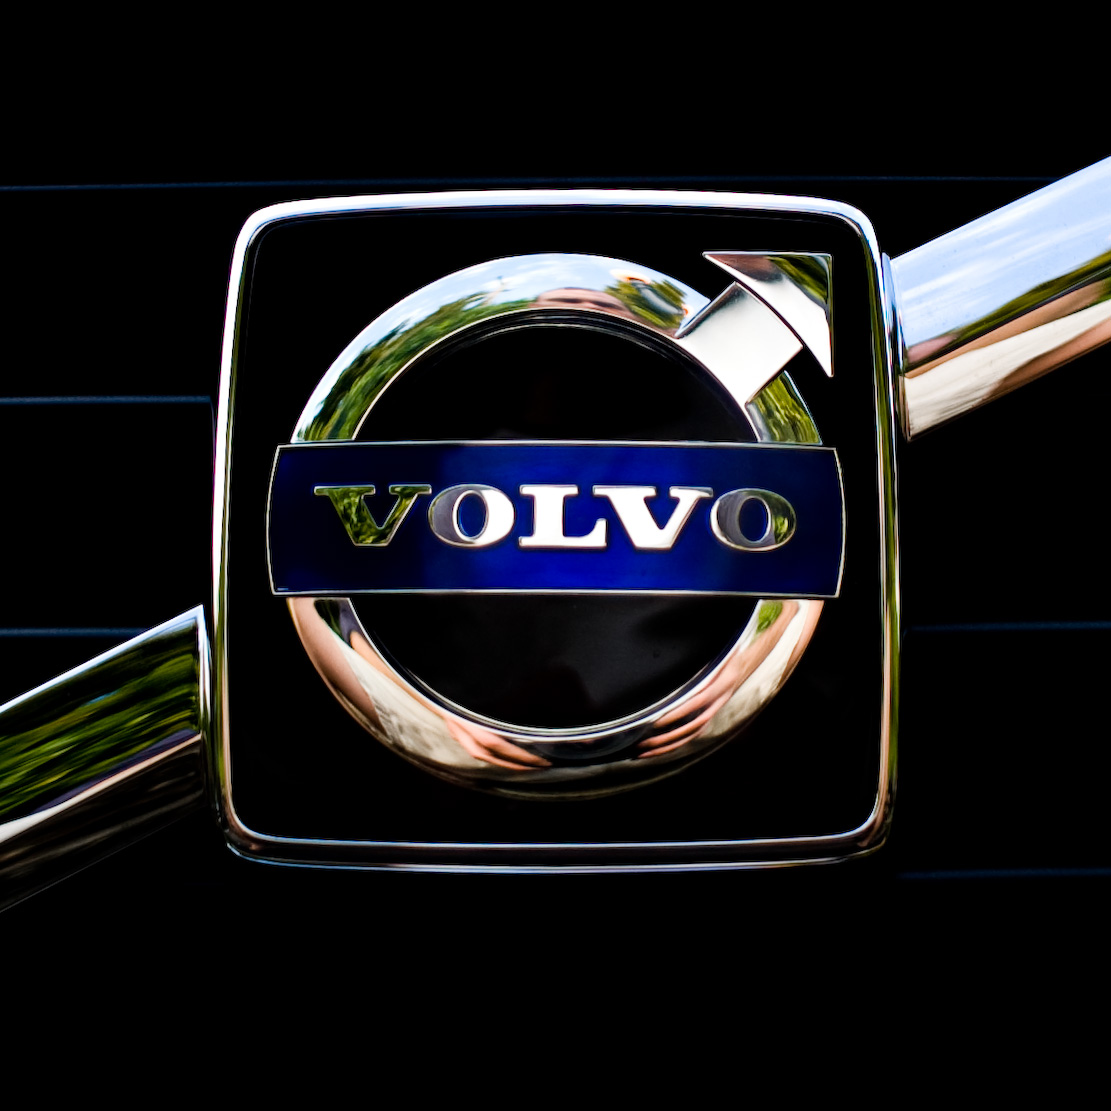 Volvo- WHIPS (Whiplash Protection System)